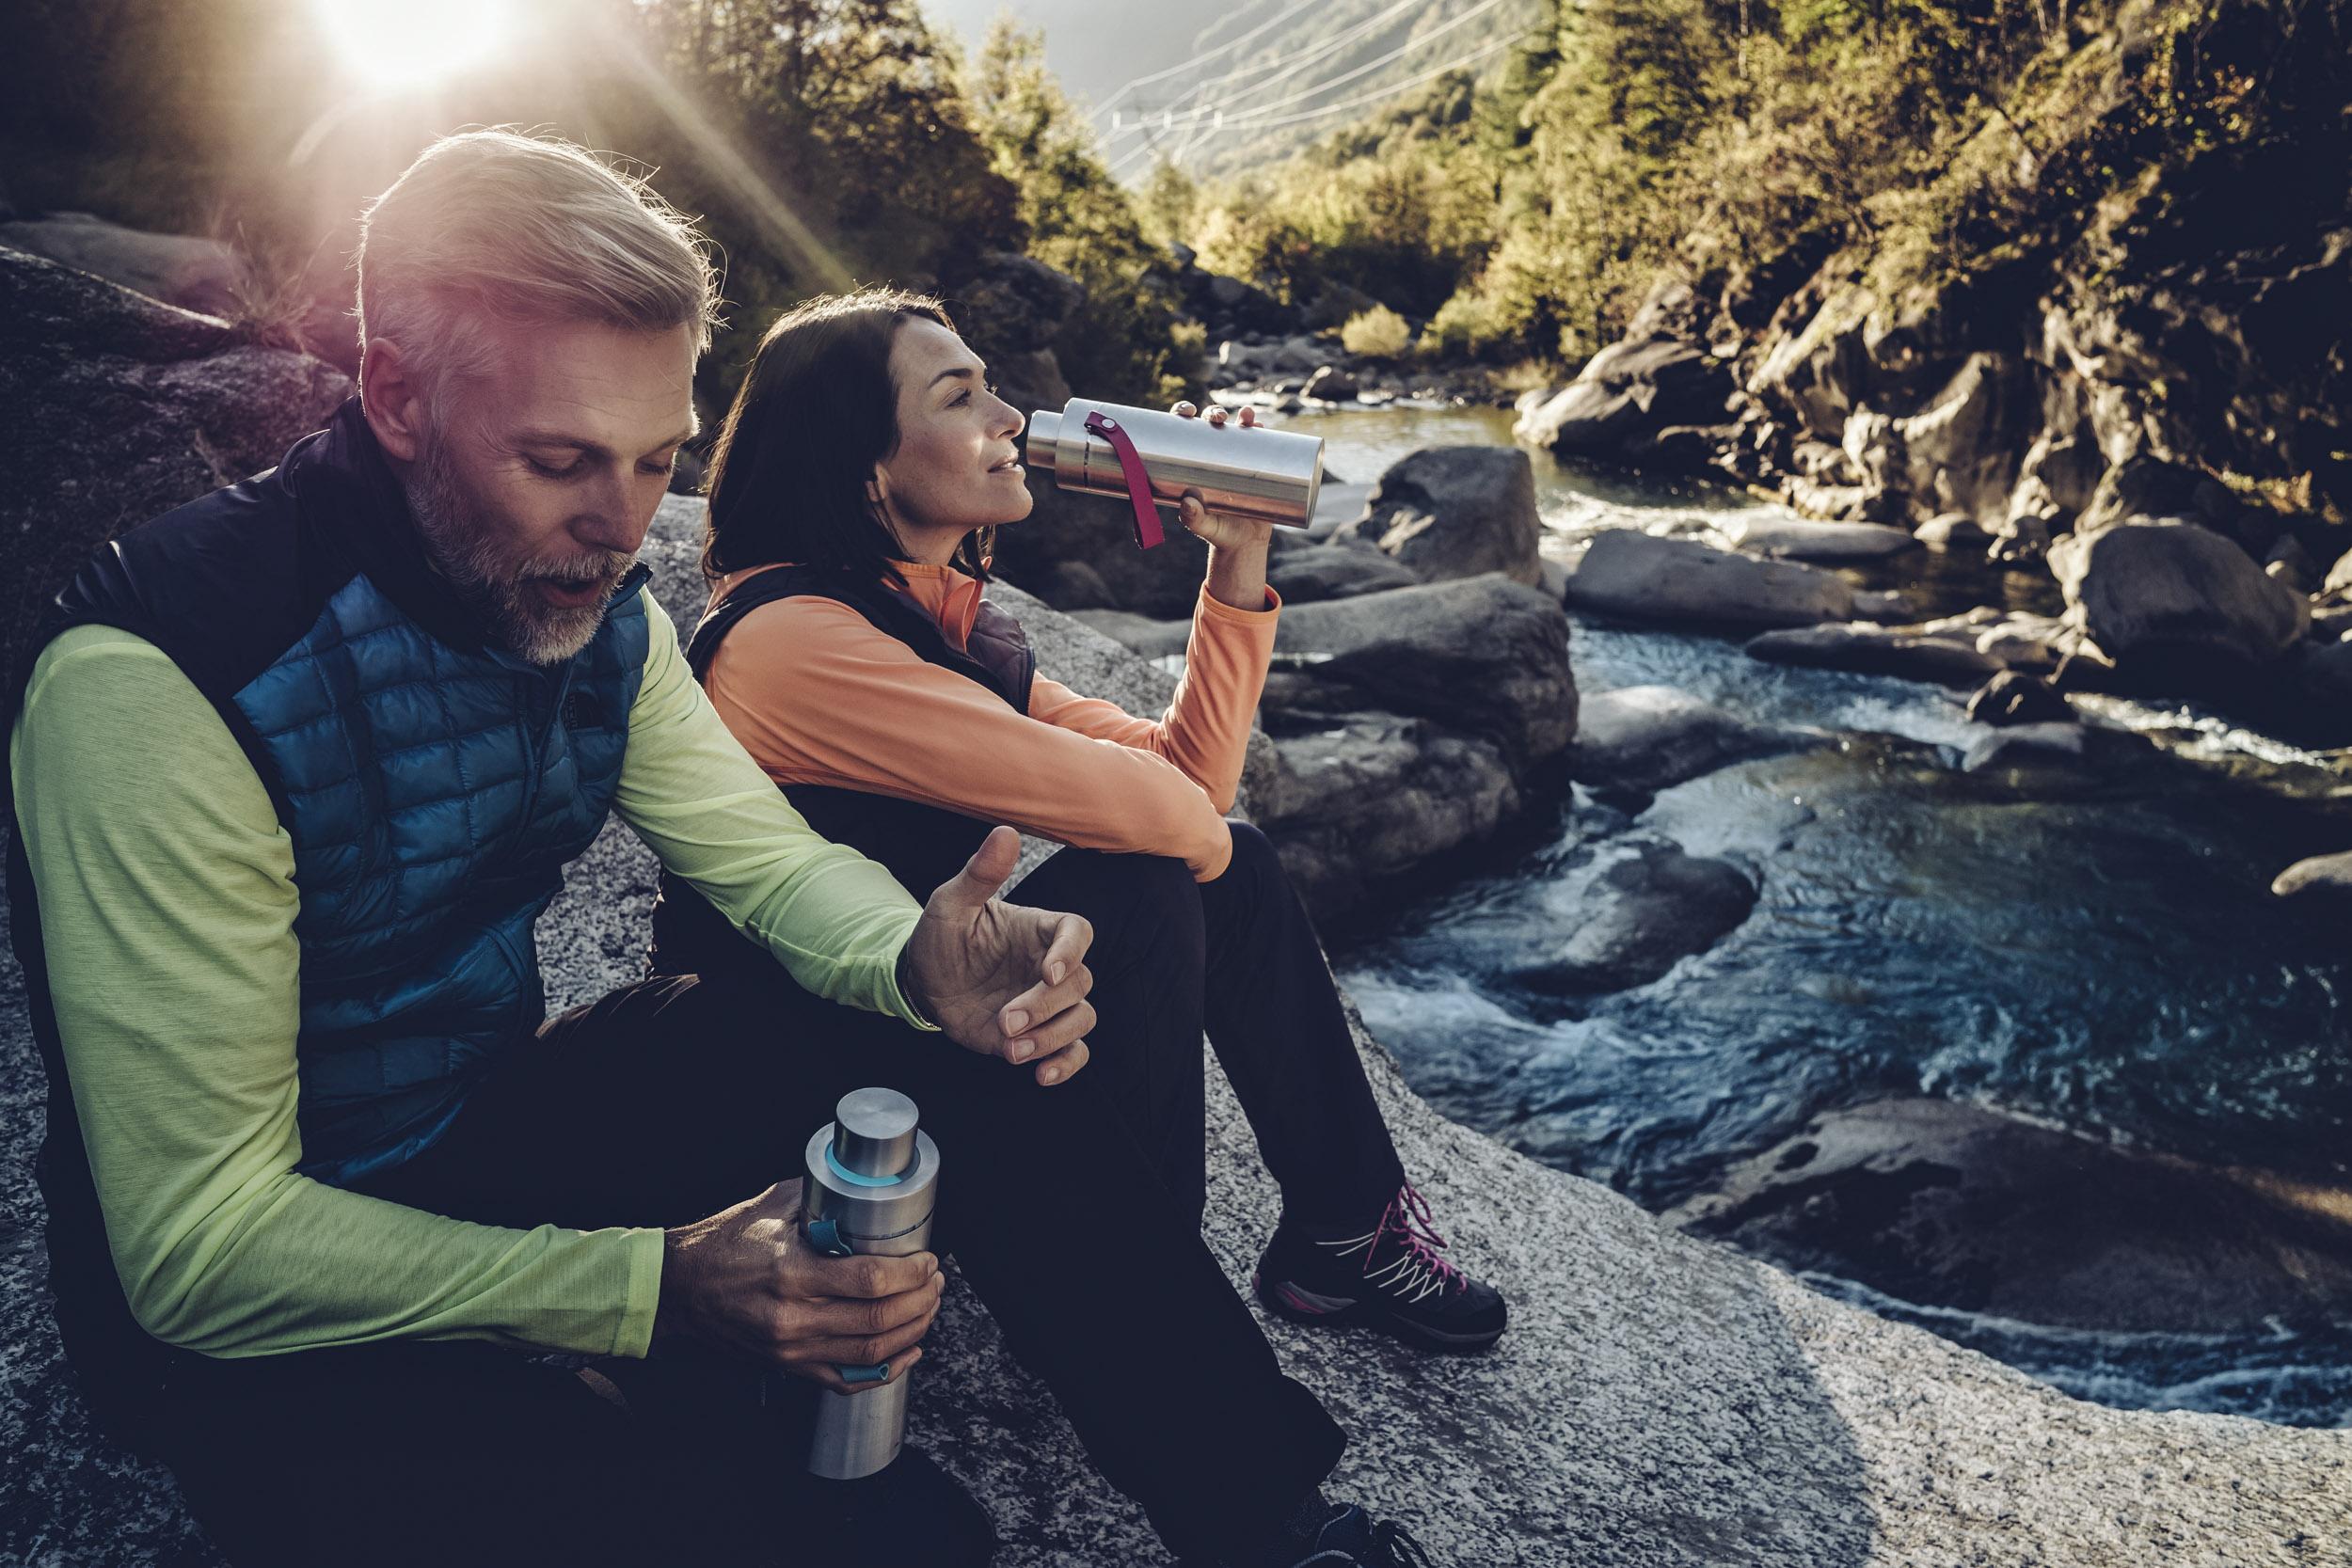 2019-SeifertUebler-luqel-outdoor-mountain-lifestyle011.jpg